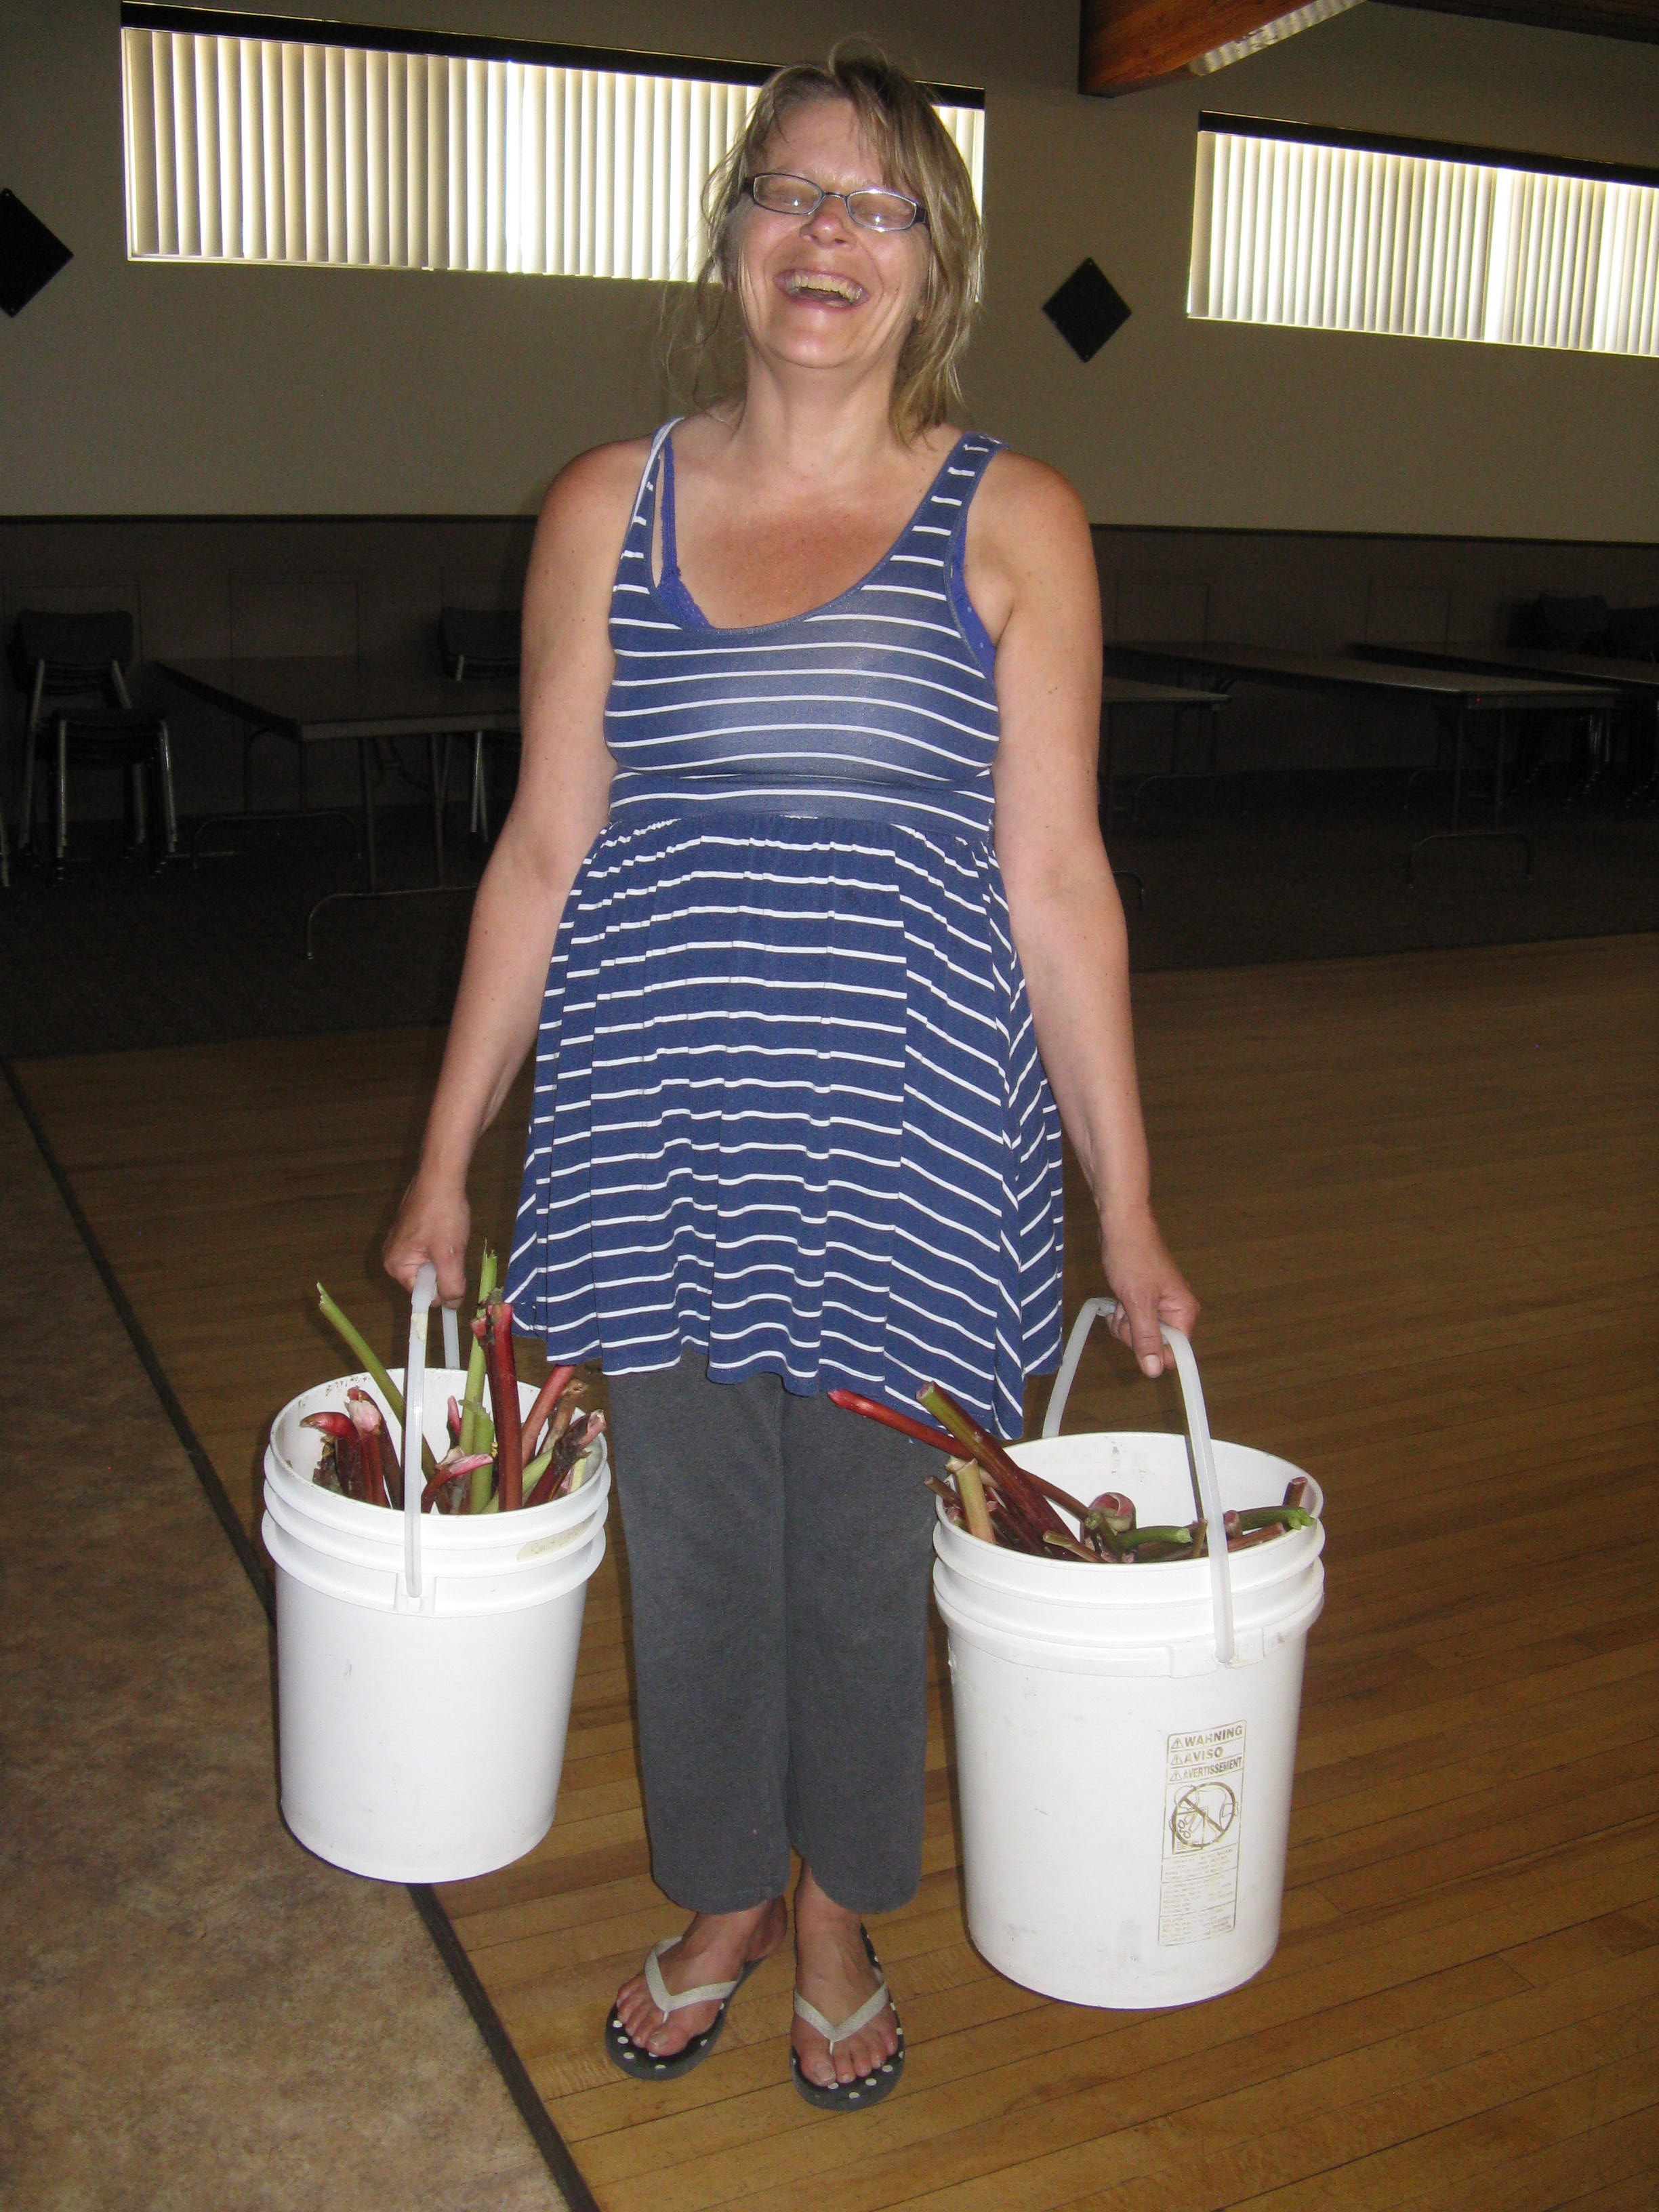 Christina - the Rhubarb picker!